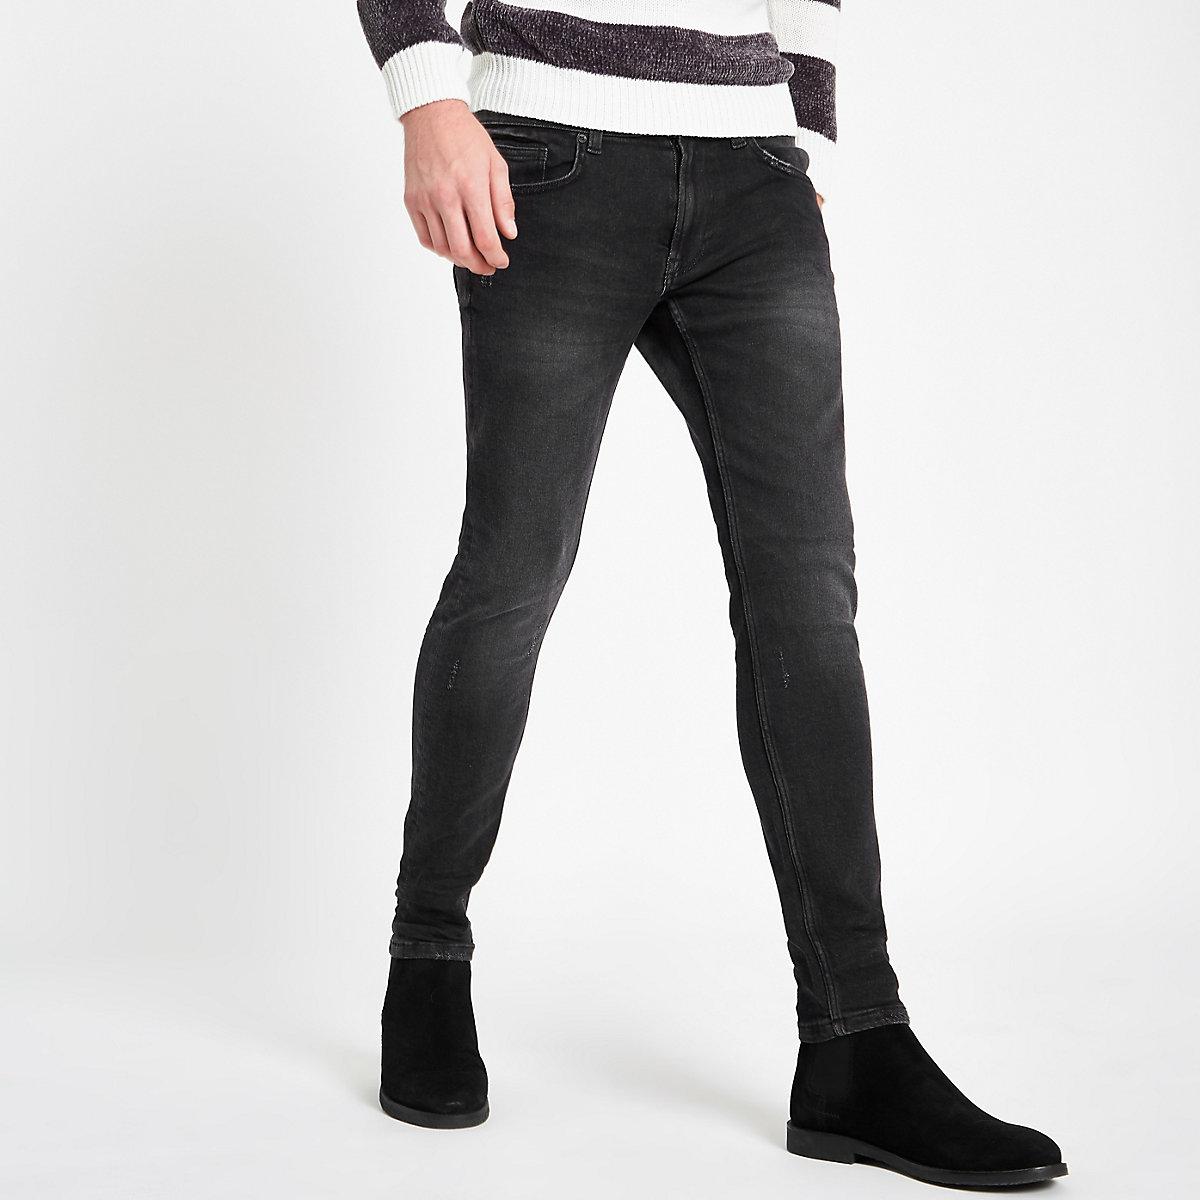 Only   Sons – Schwarze Slim Fit Jeans - Skinny Jeans - Jeans - Herren cce7d76971